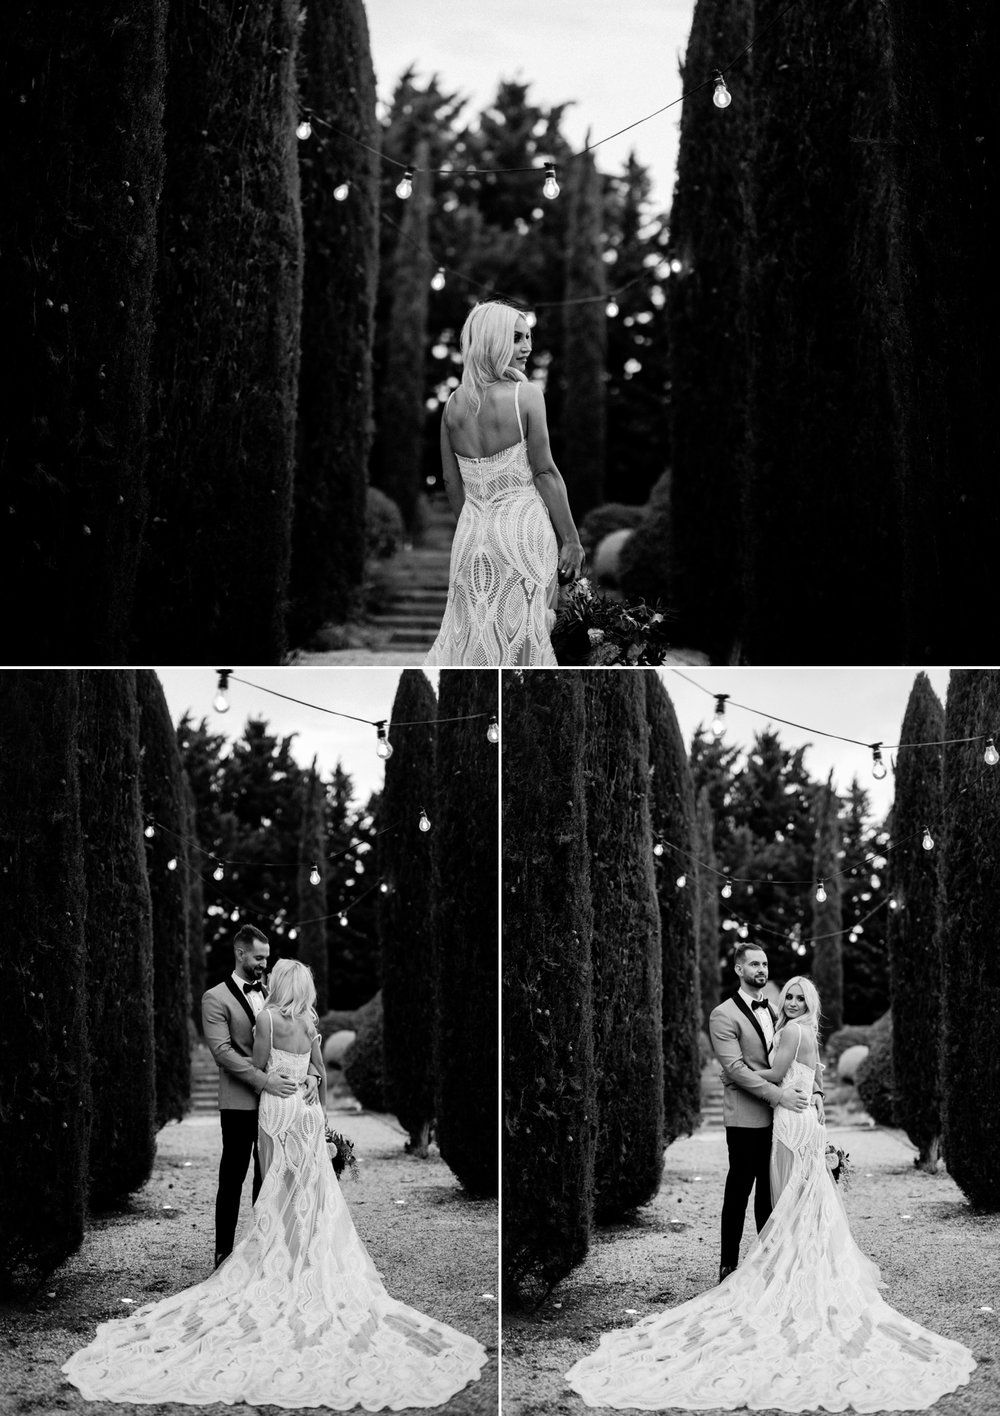 Sam & Tyson - Mandalay House and Garden Wedding Photographer - Mandalay House and Garden Wedding - Natural Wedding Photography - www.katherineschultzphotography.com_0047.jpg